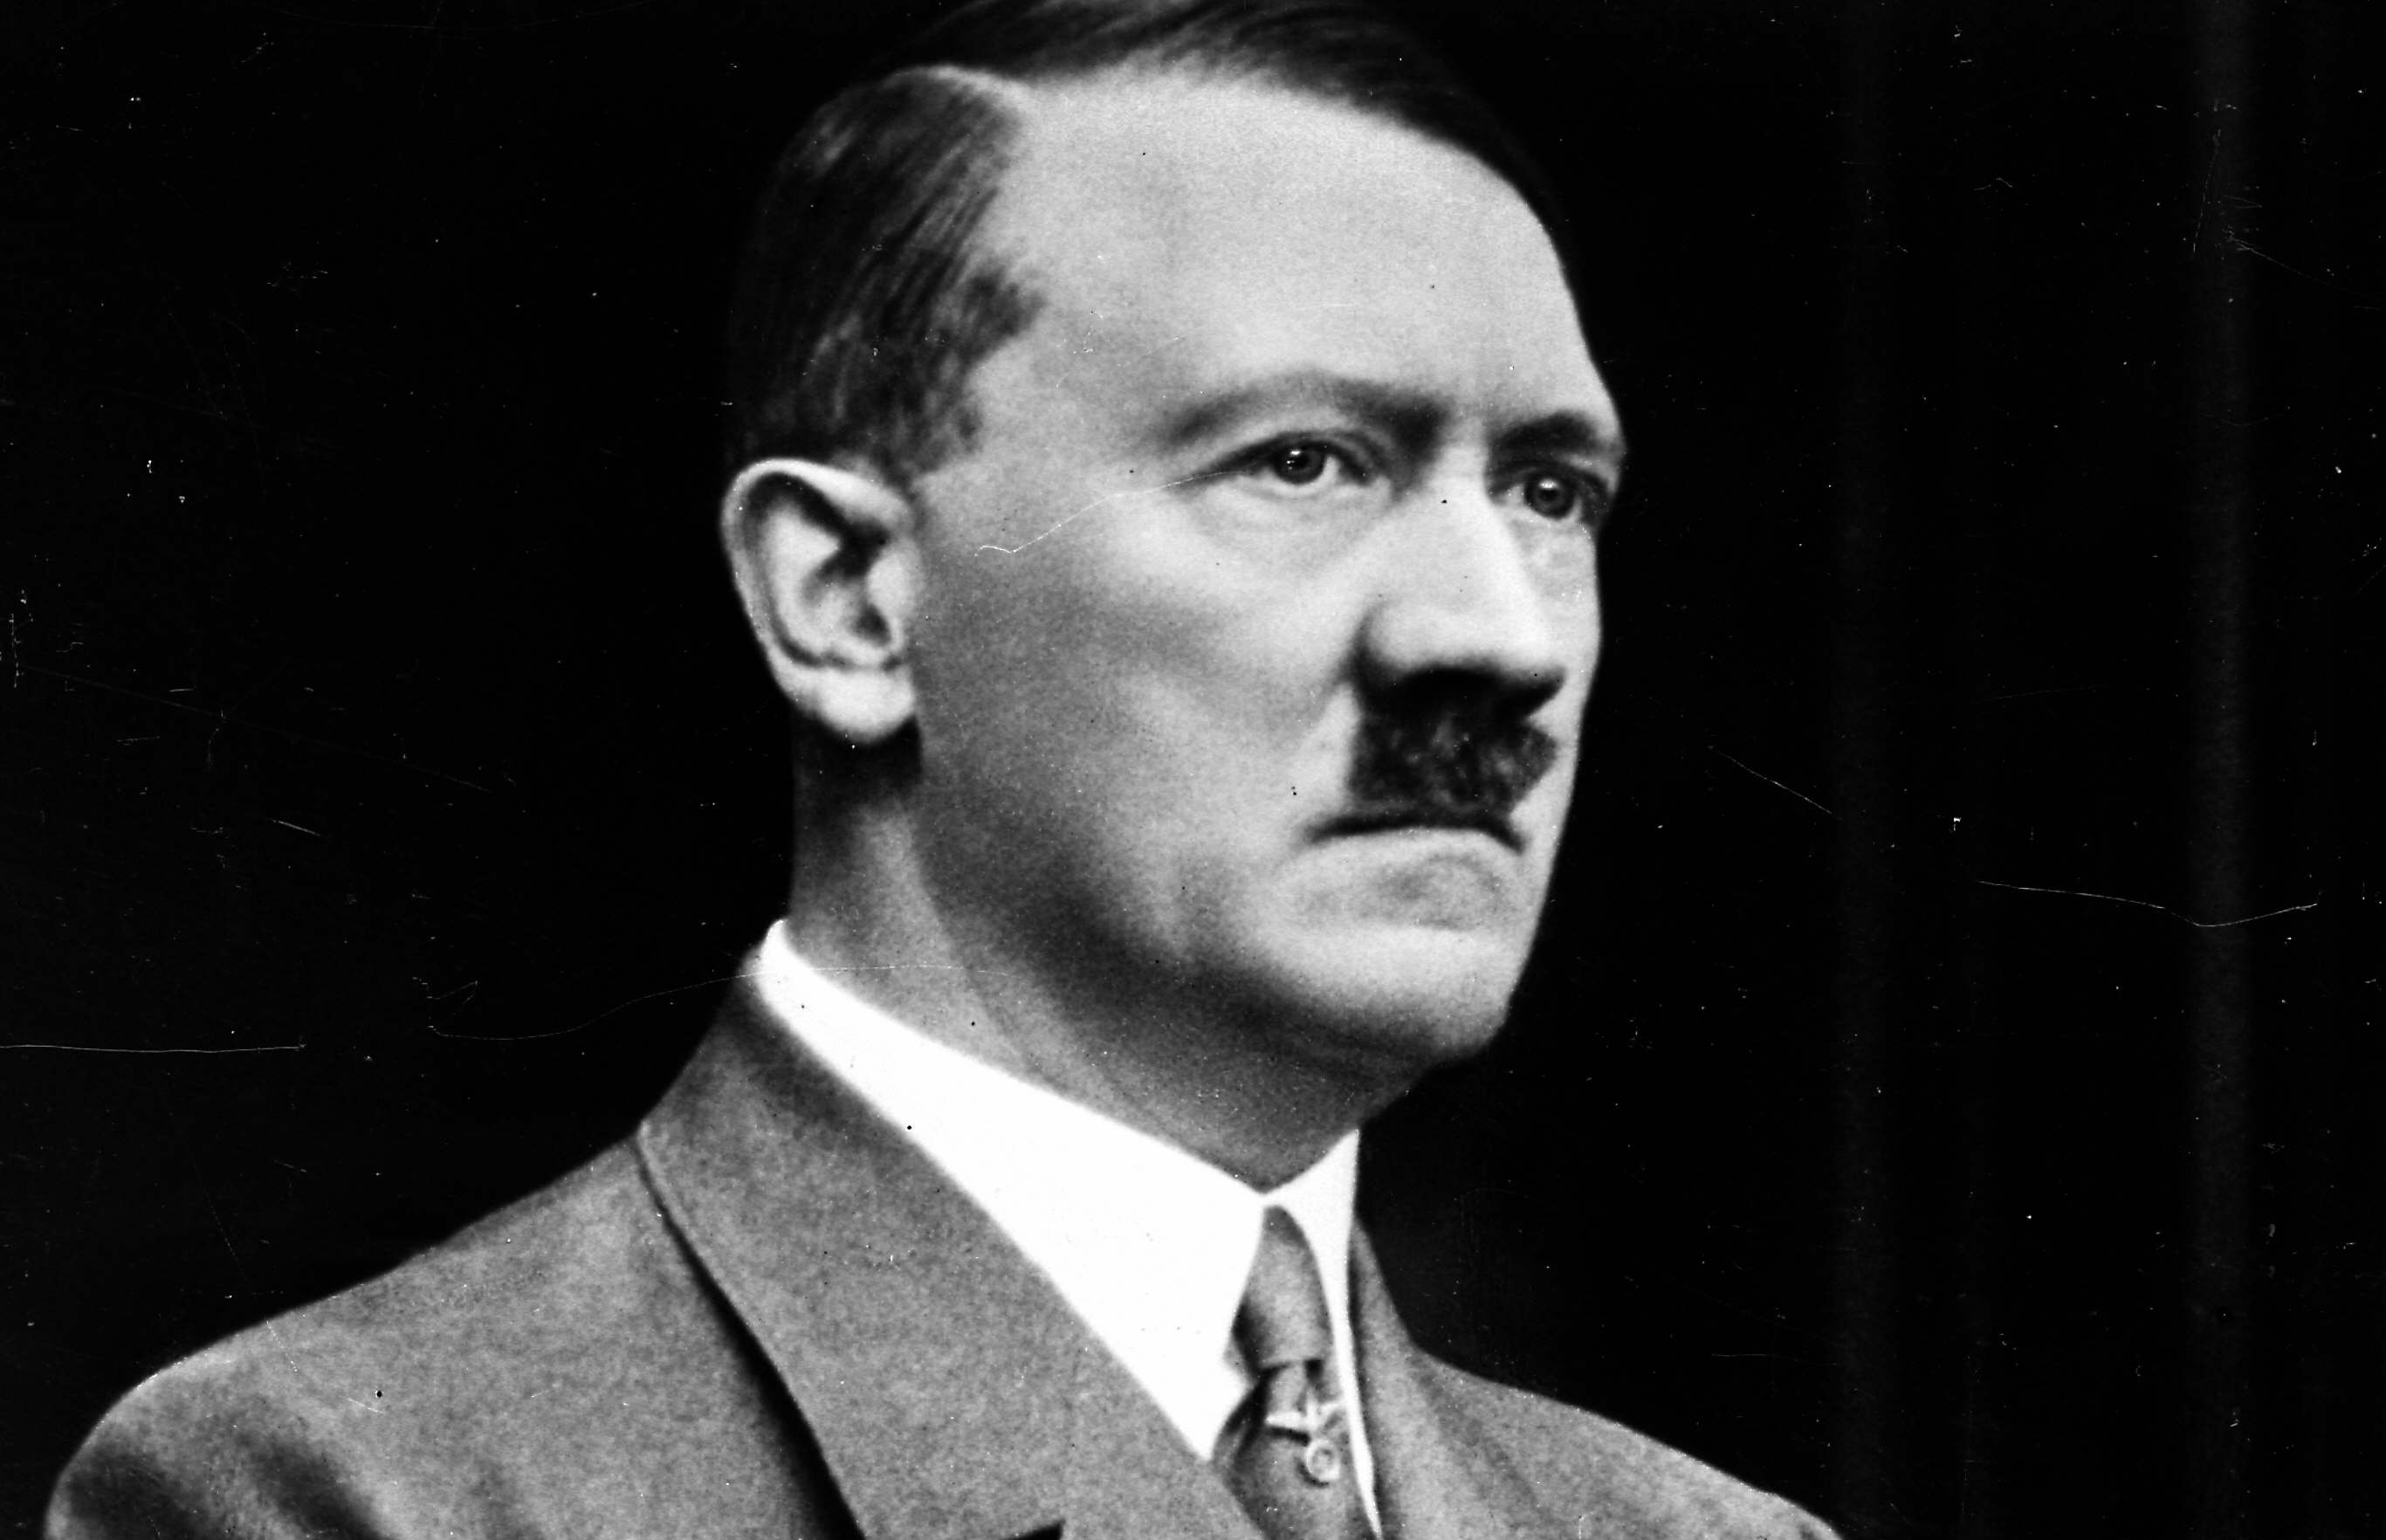 Photo of Adolf Hitler